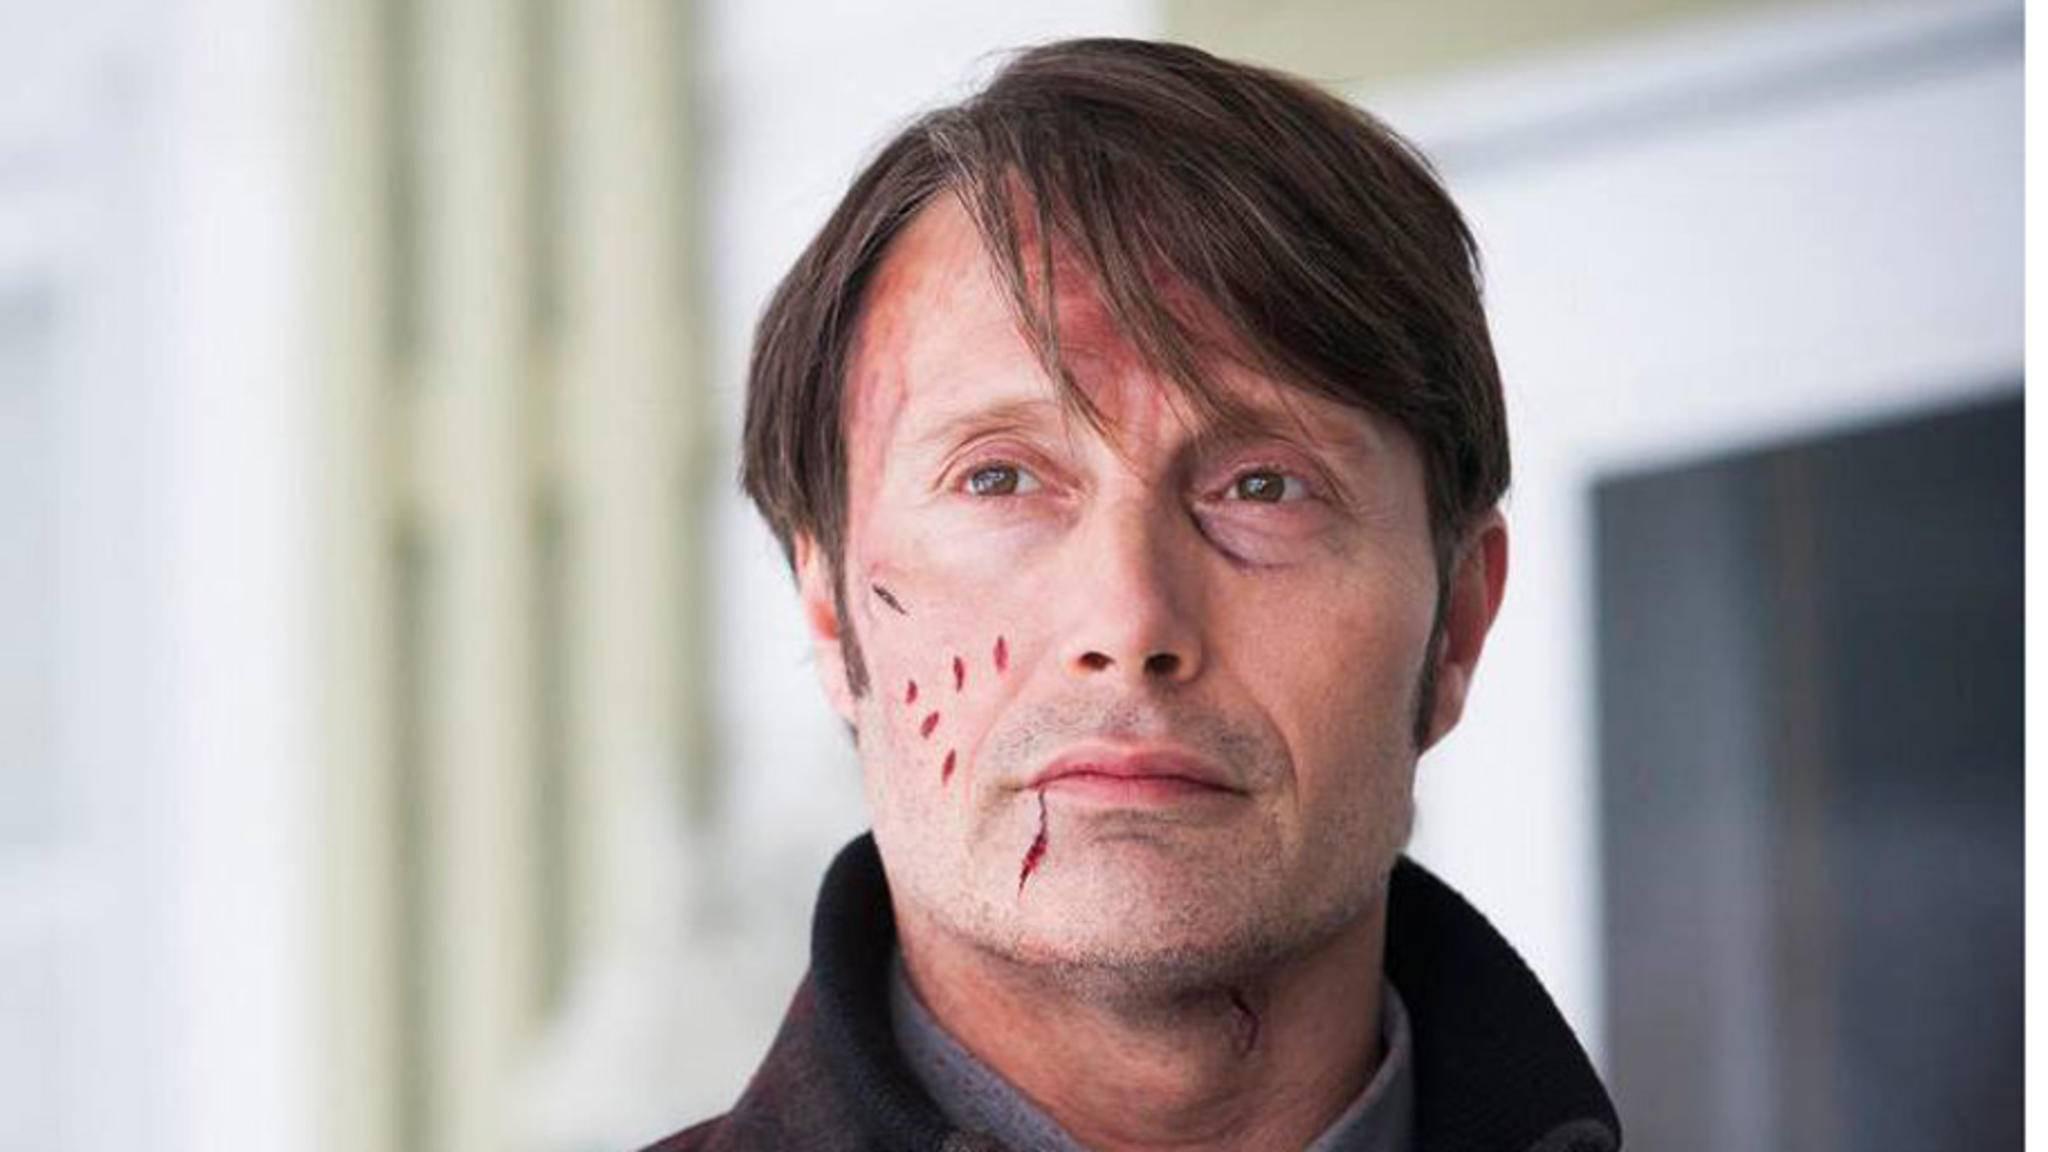 Geht Mads Mikkelsen alias Hannibal Lecter bald wieder in Serie?